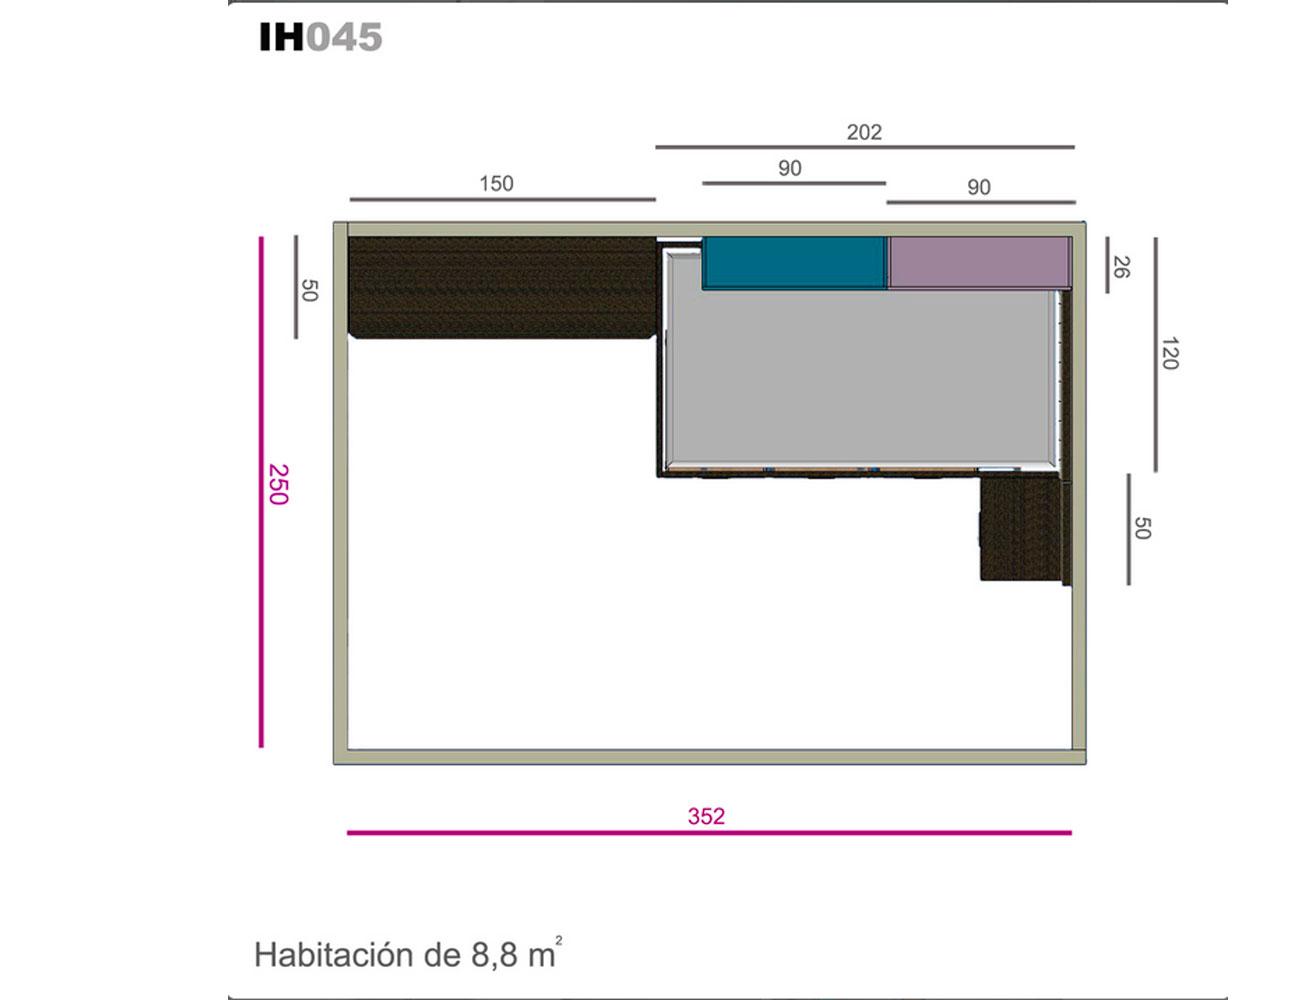 Ih045 medidas